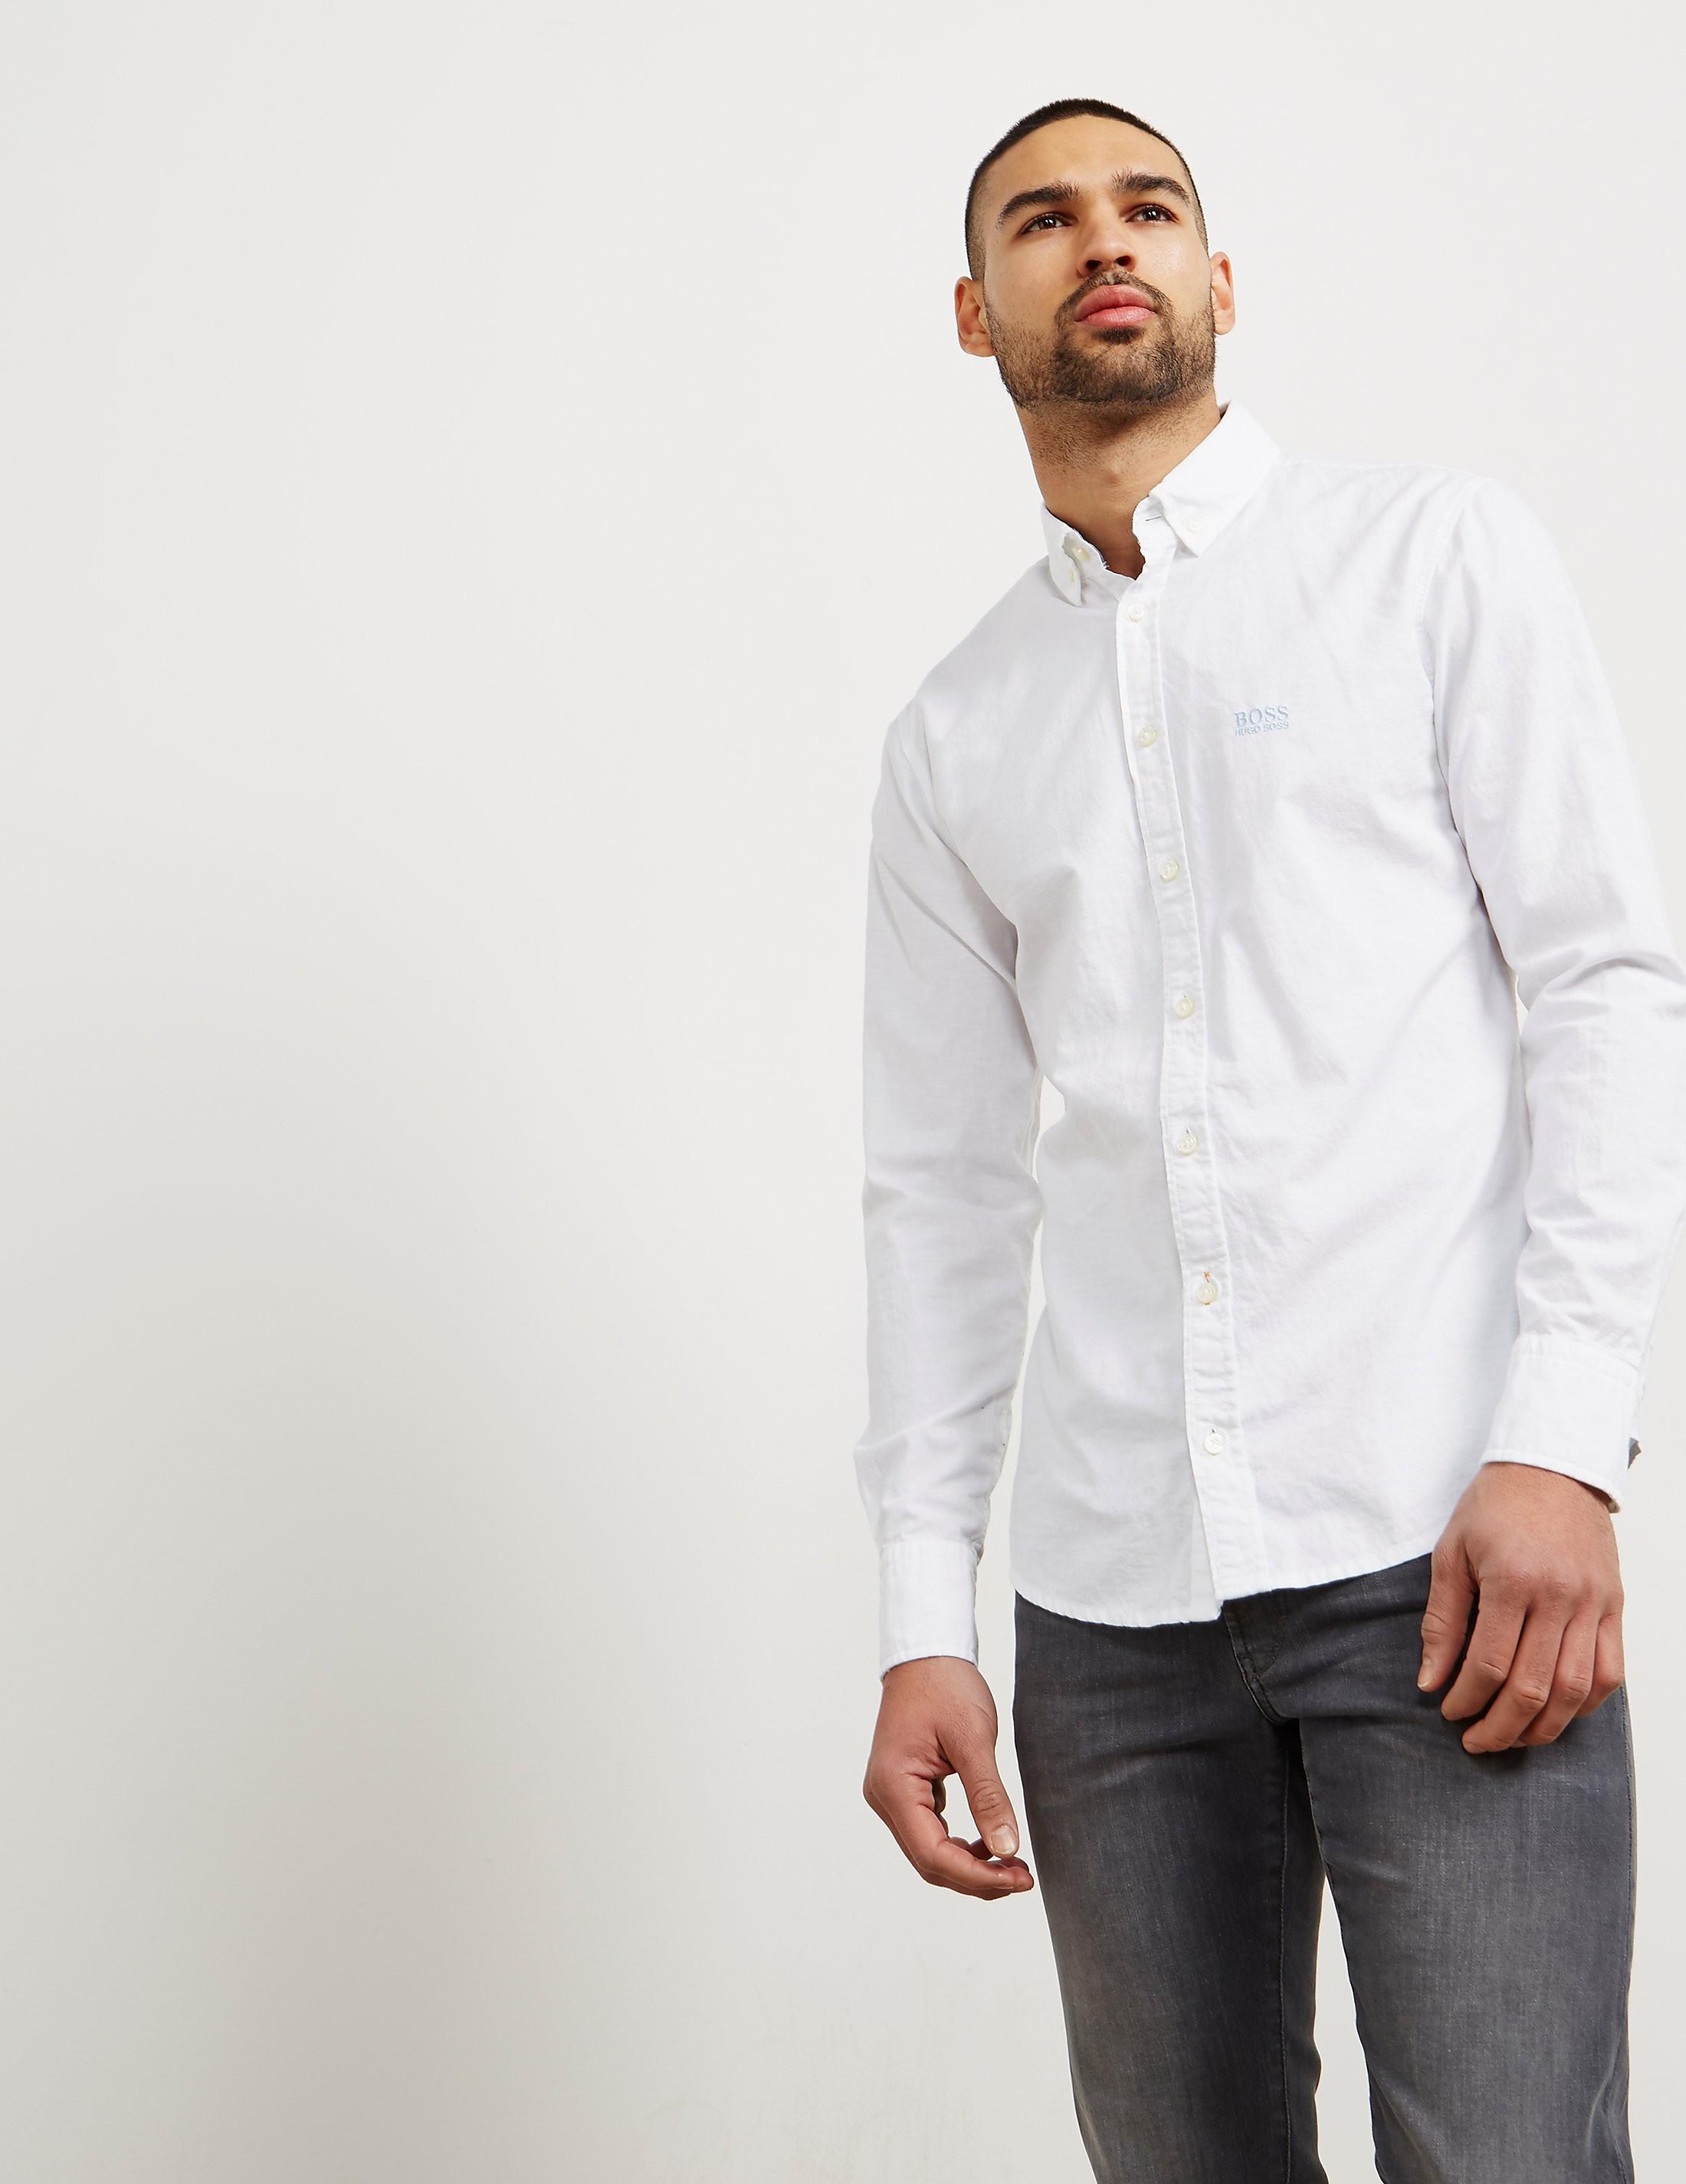 BOSS E-Preppy Long Sleeve Shirt